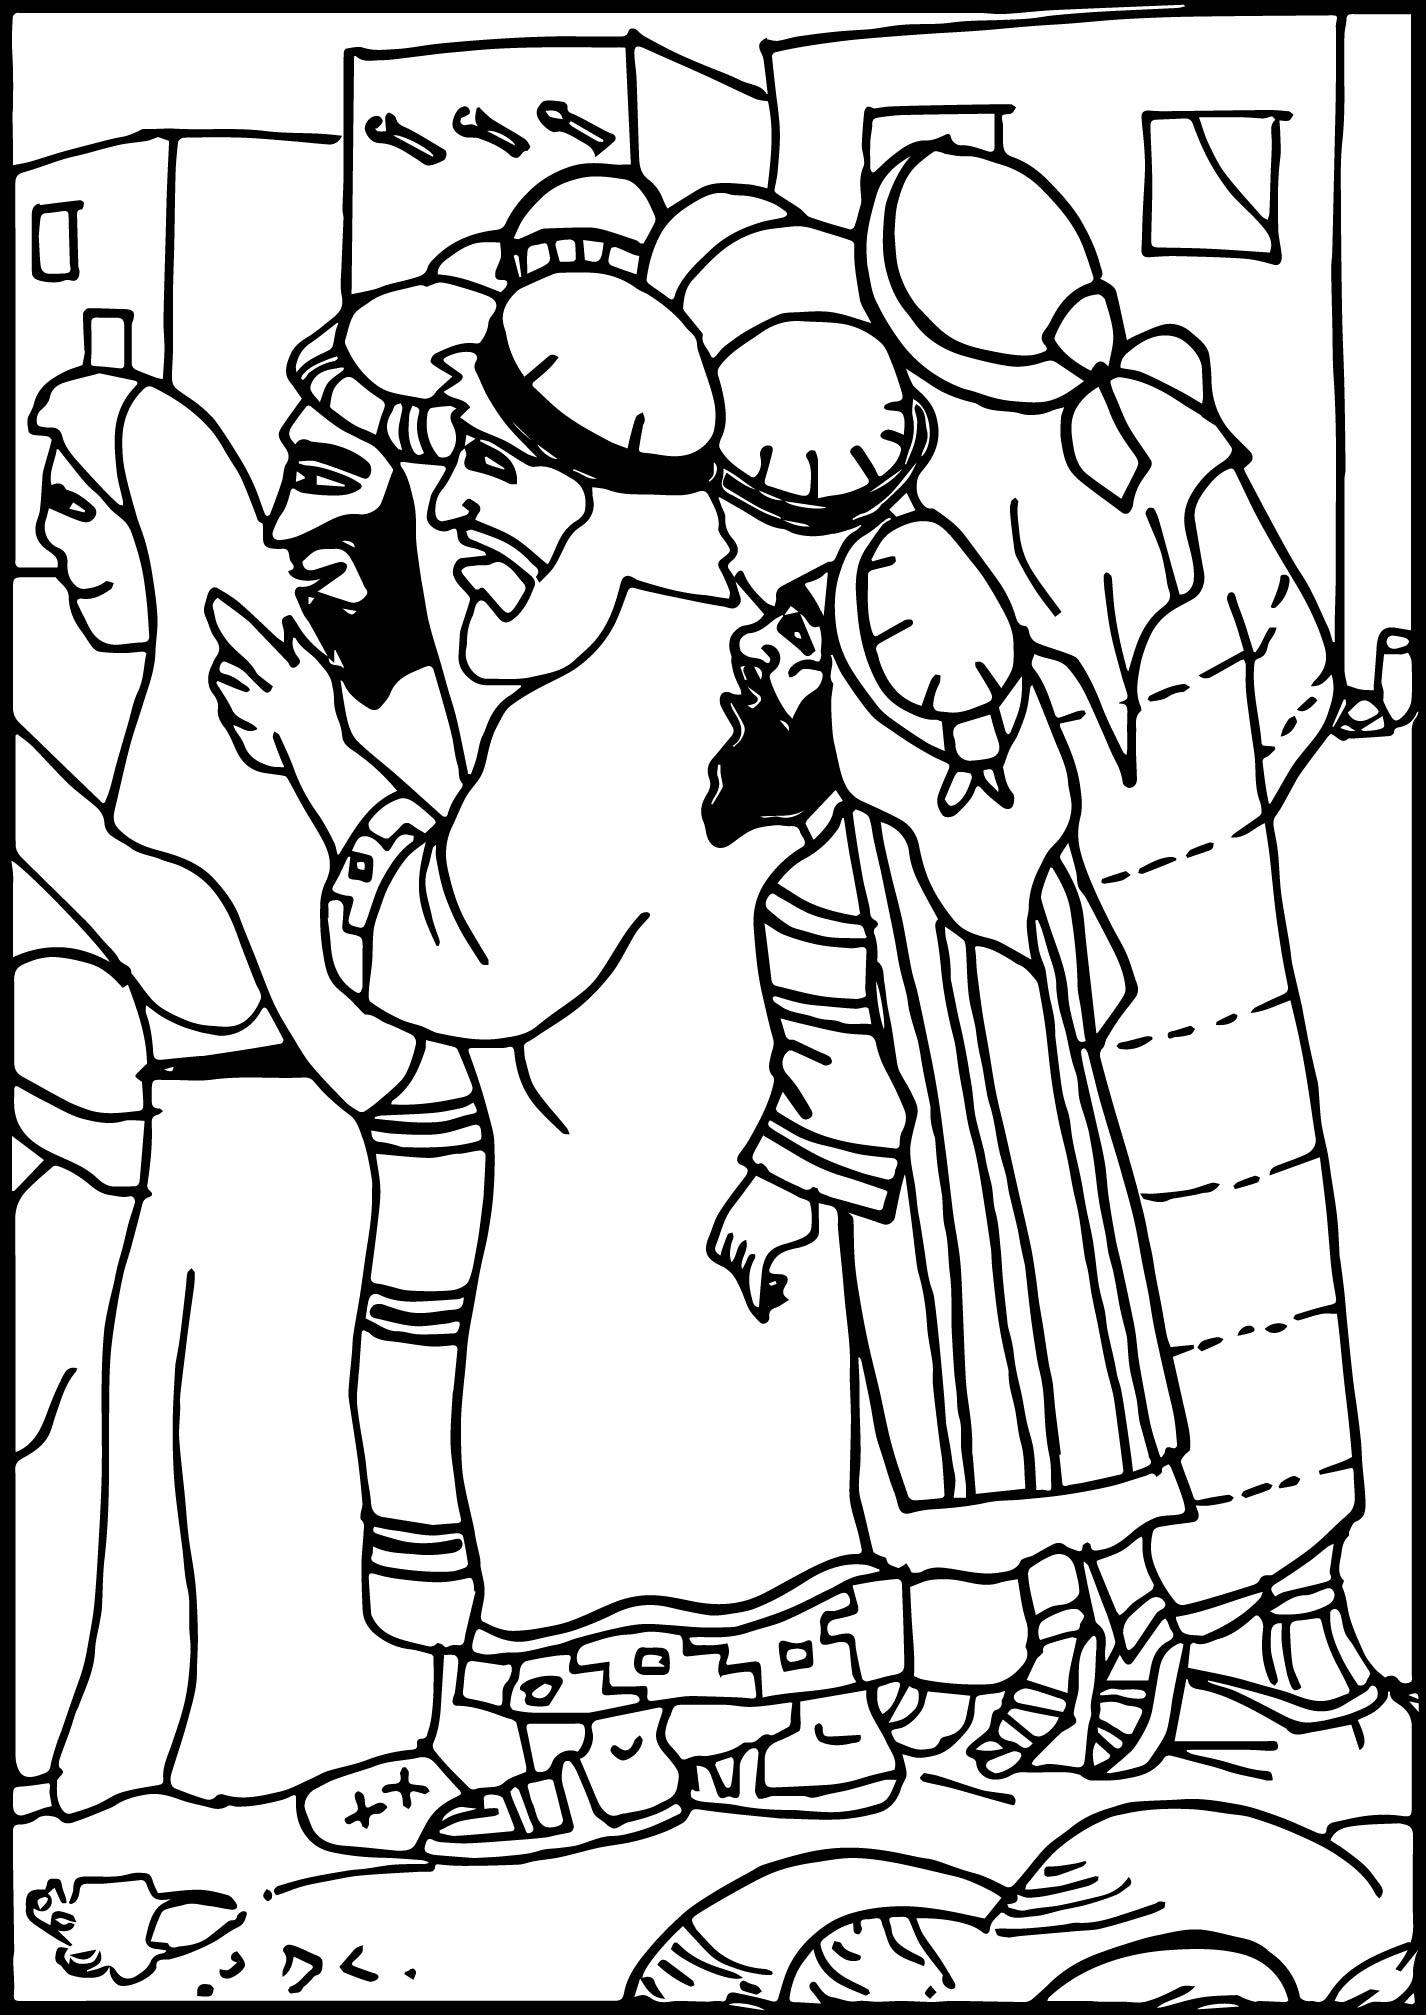 Zacchaeus What Is It Jesus Coloring Page | Wecoloringpage.com